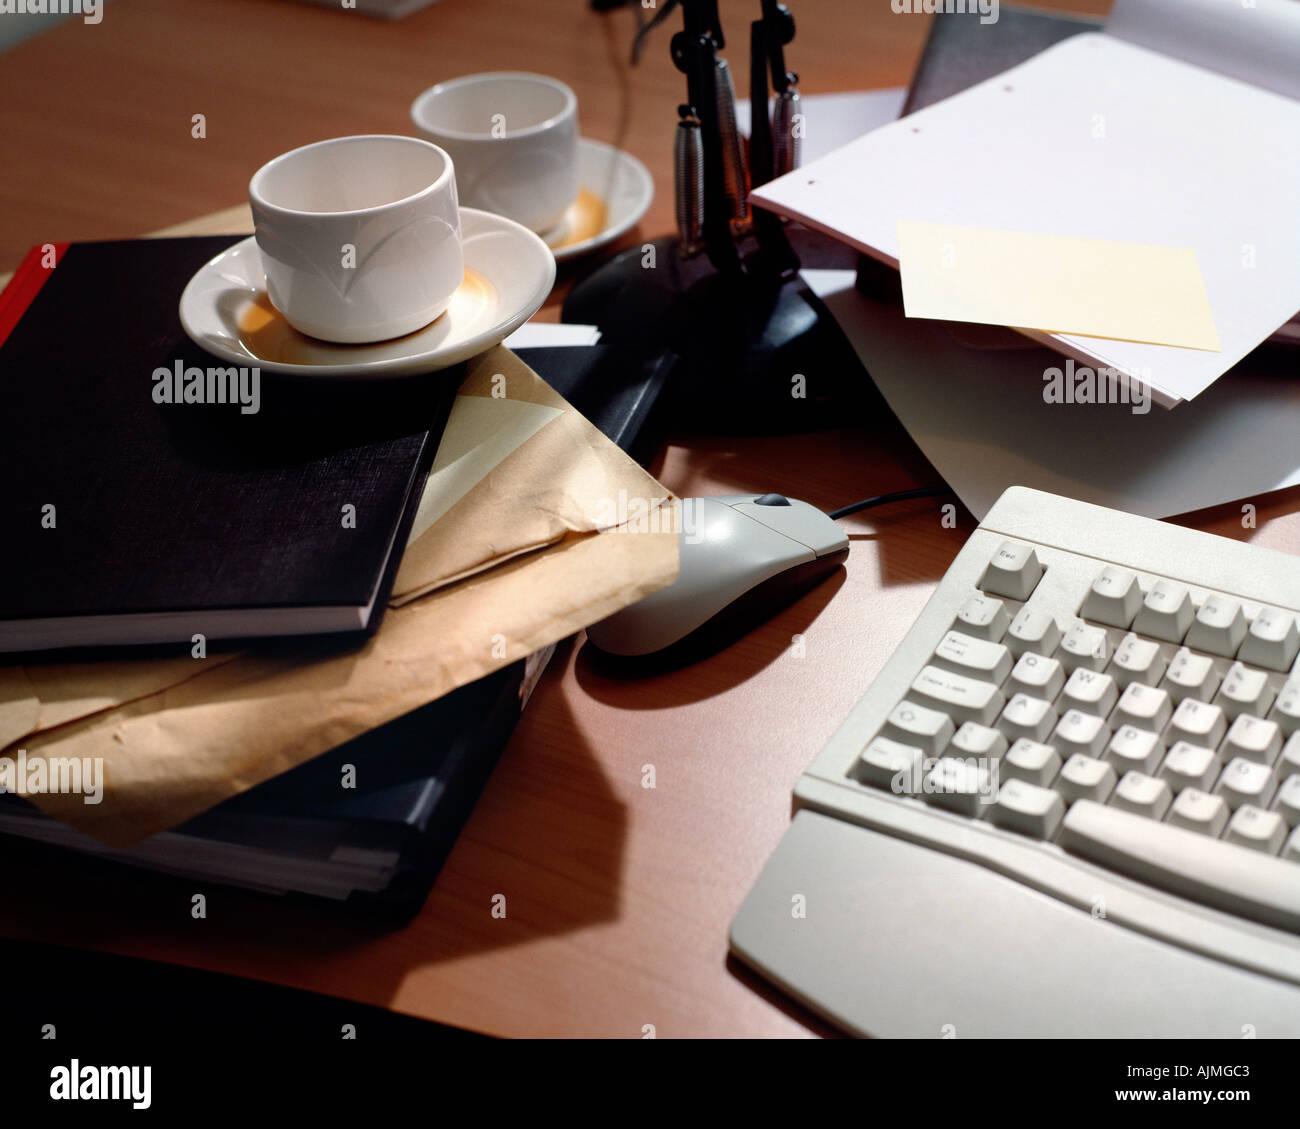 Messy desk - Stock Image